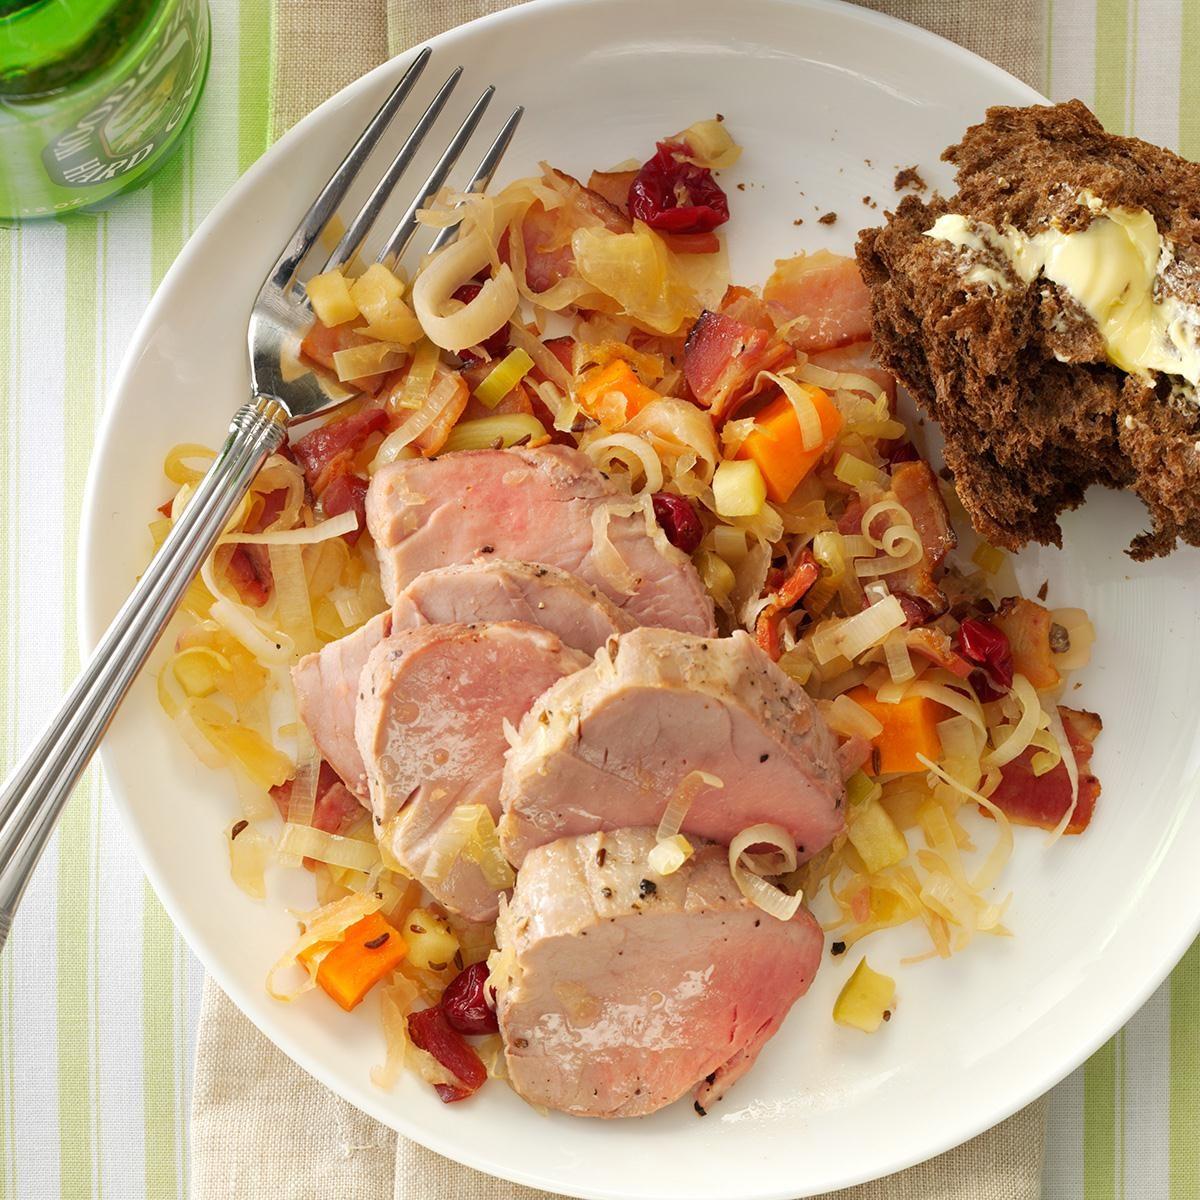 Recipe pork loin sauerkraut apples